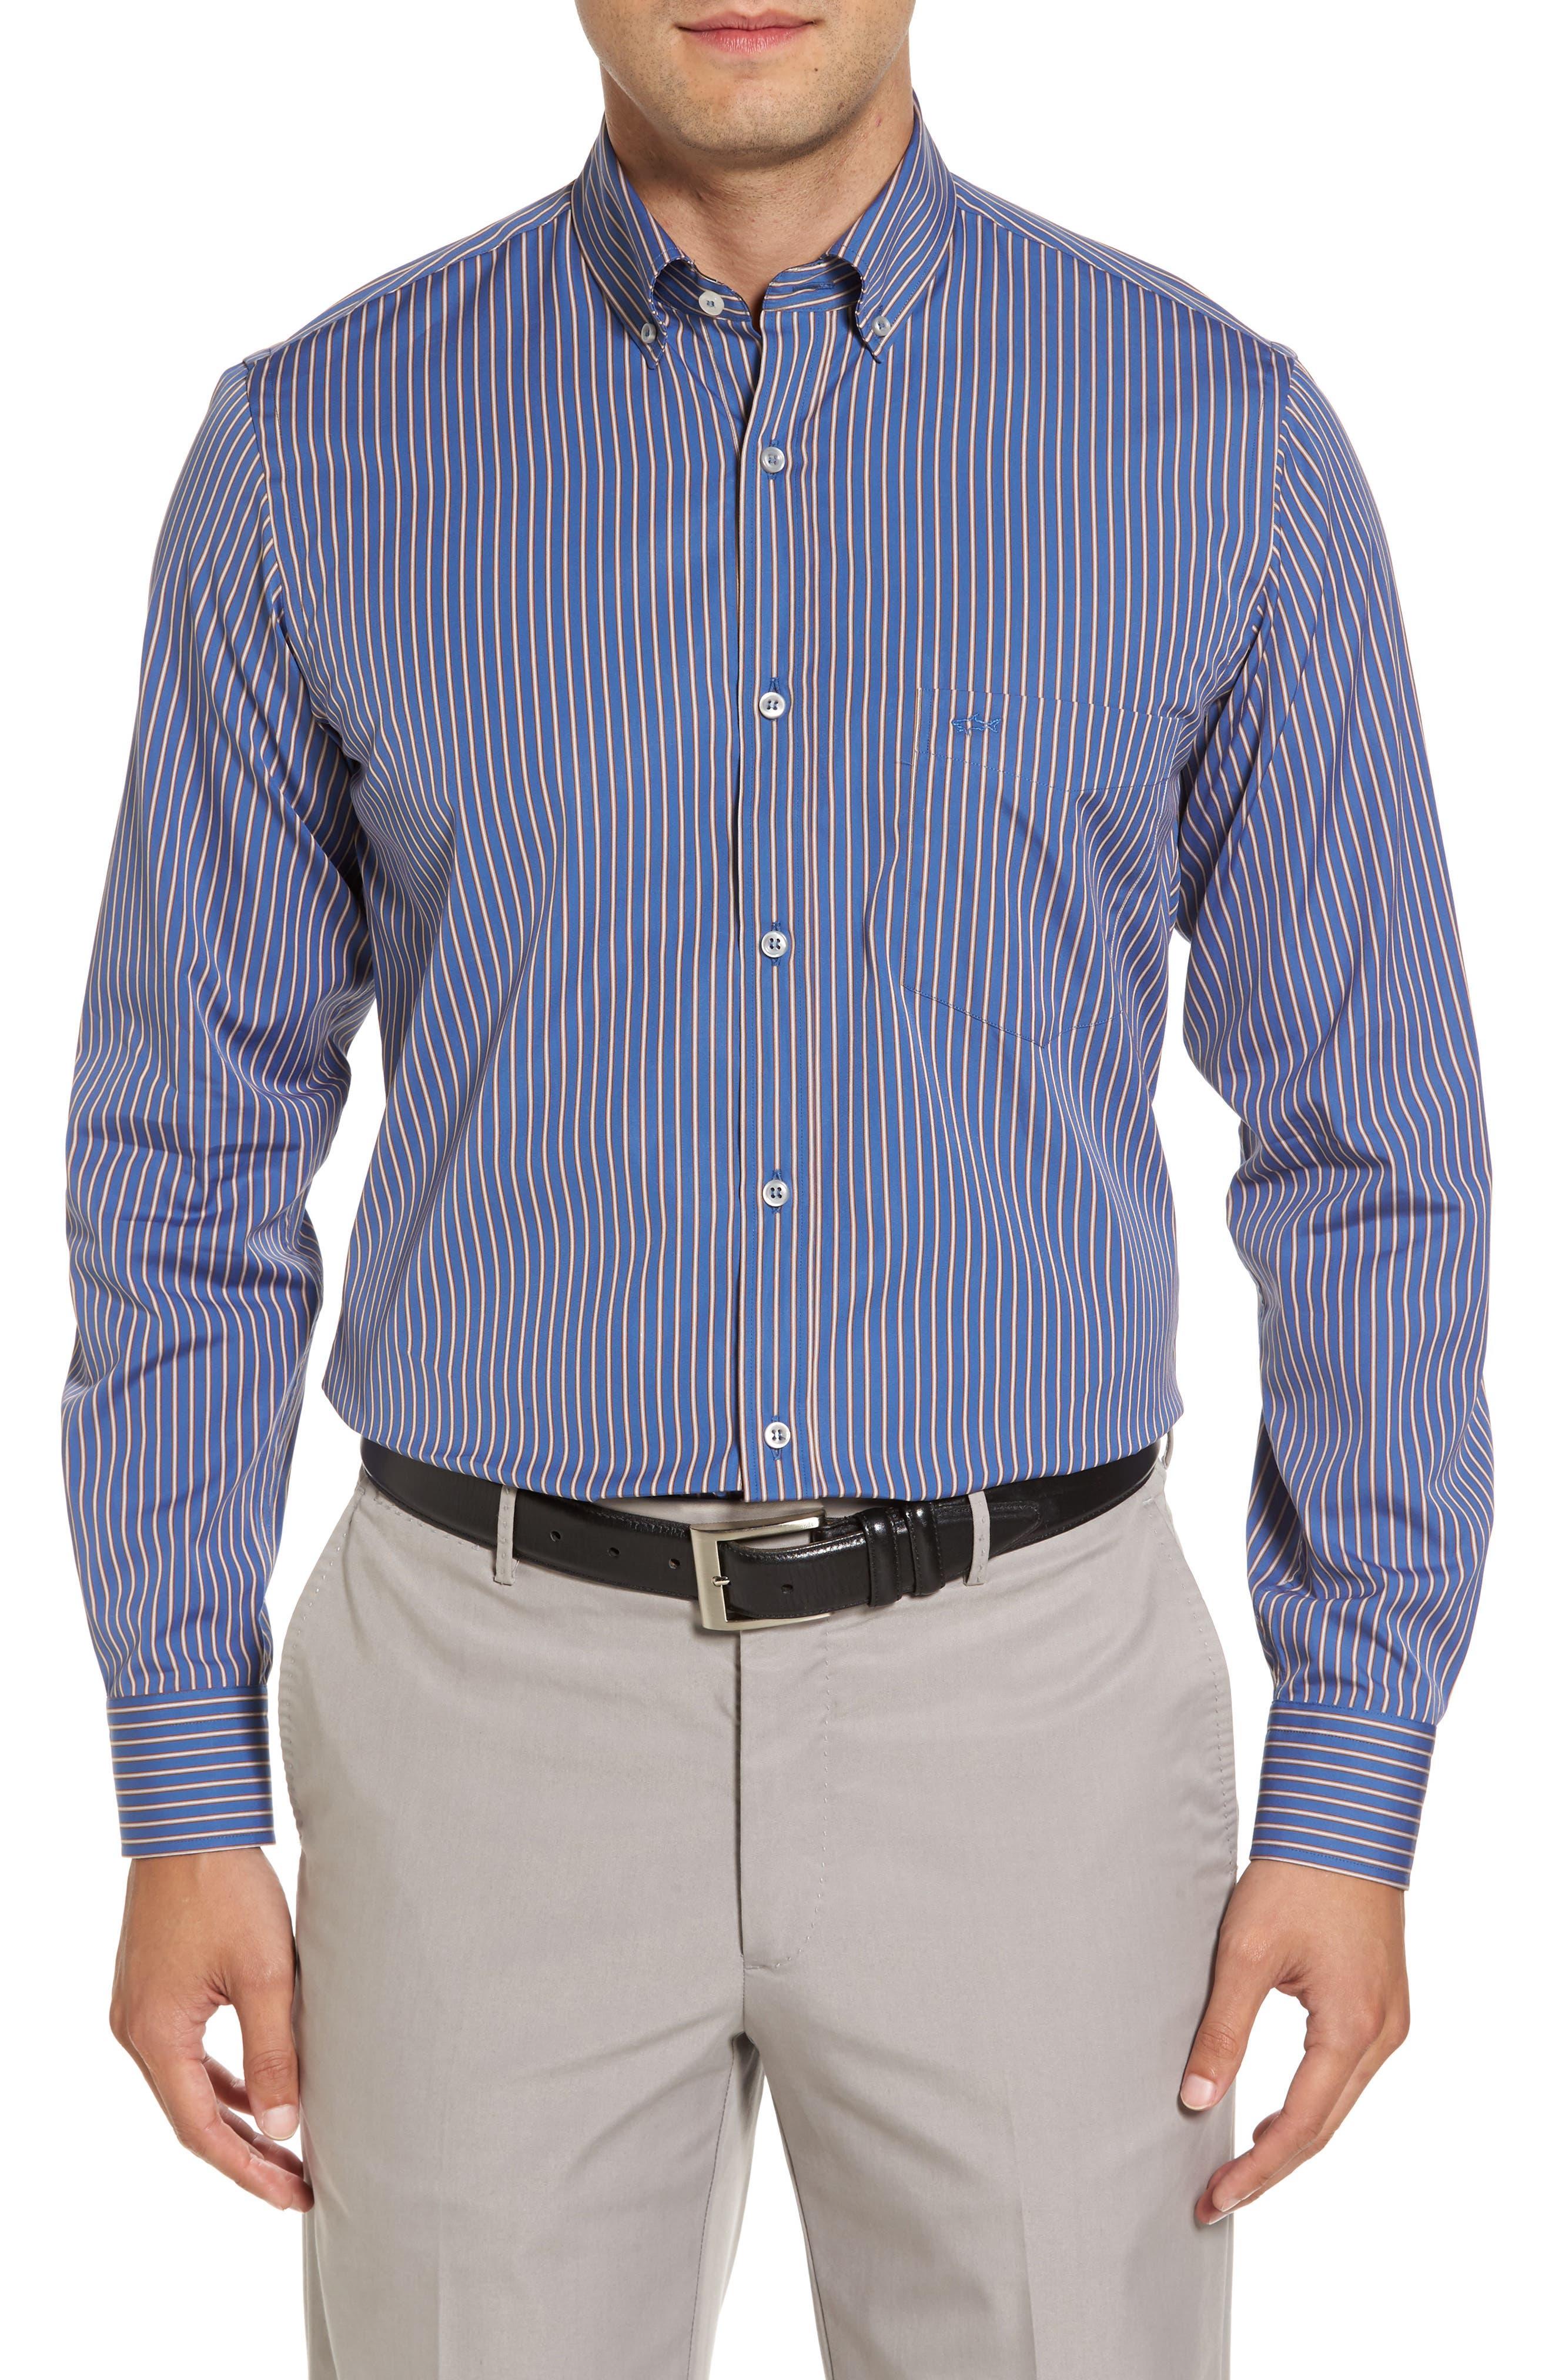 Paul&Shark Striped Sport Shirt,                         Main,                         color, Blue / White